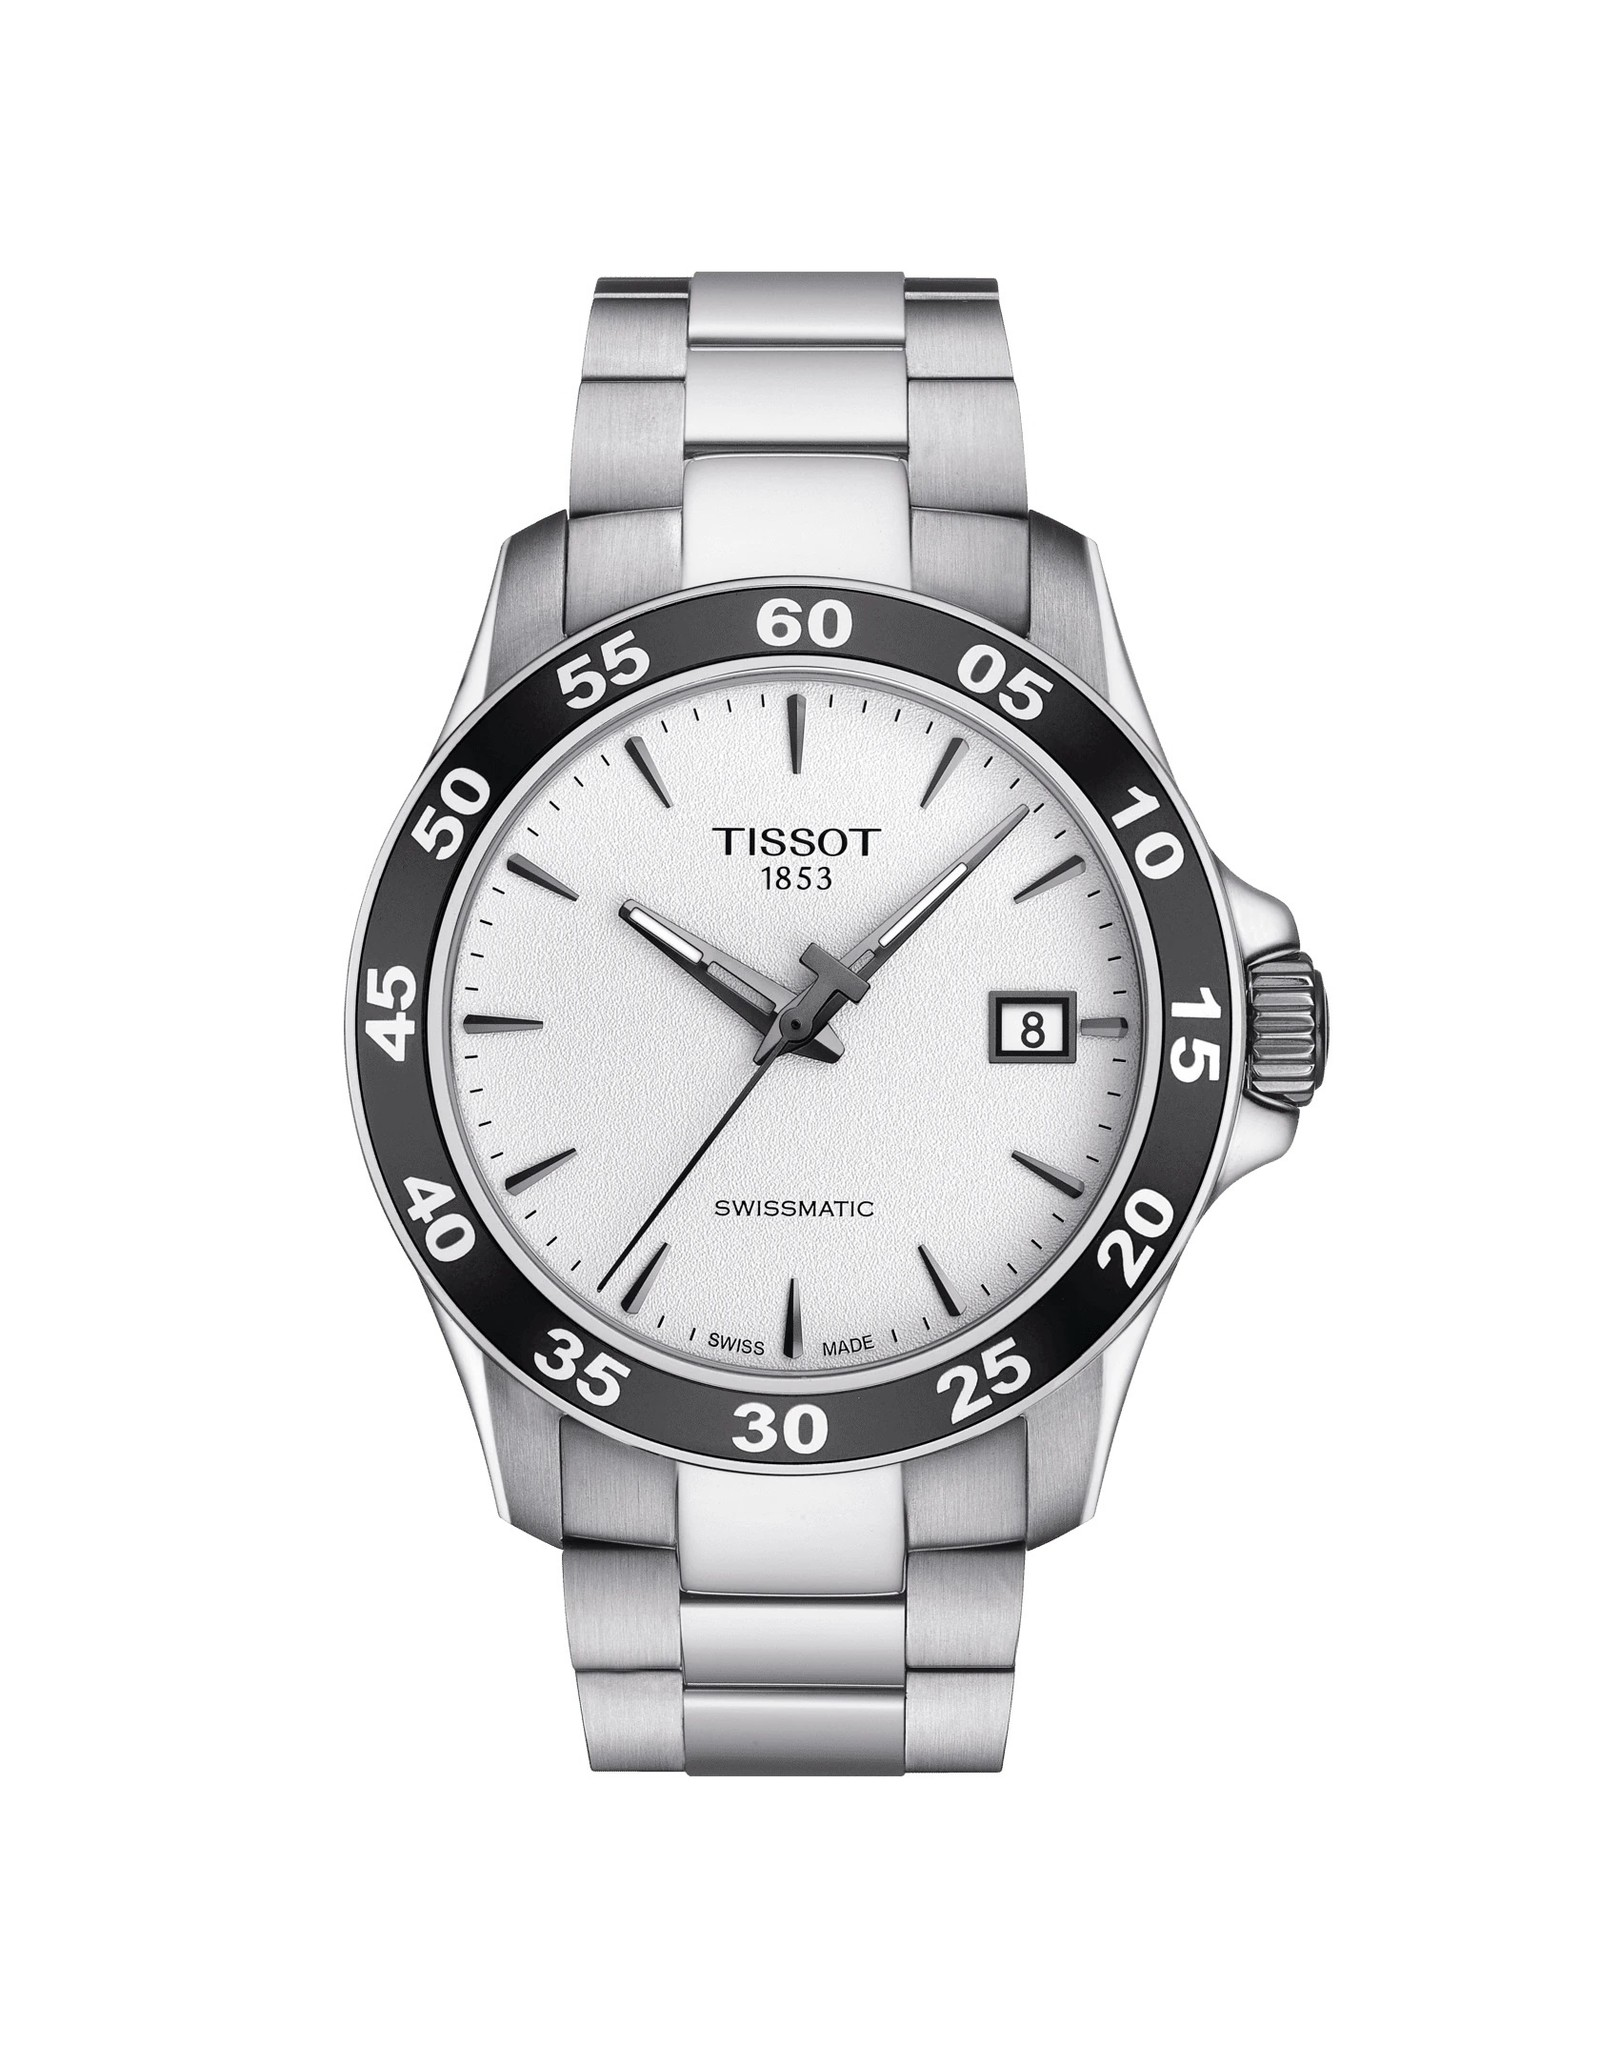 Tissot Tissot V8 Swissmatic Watch